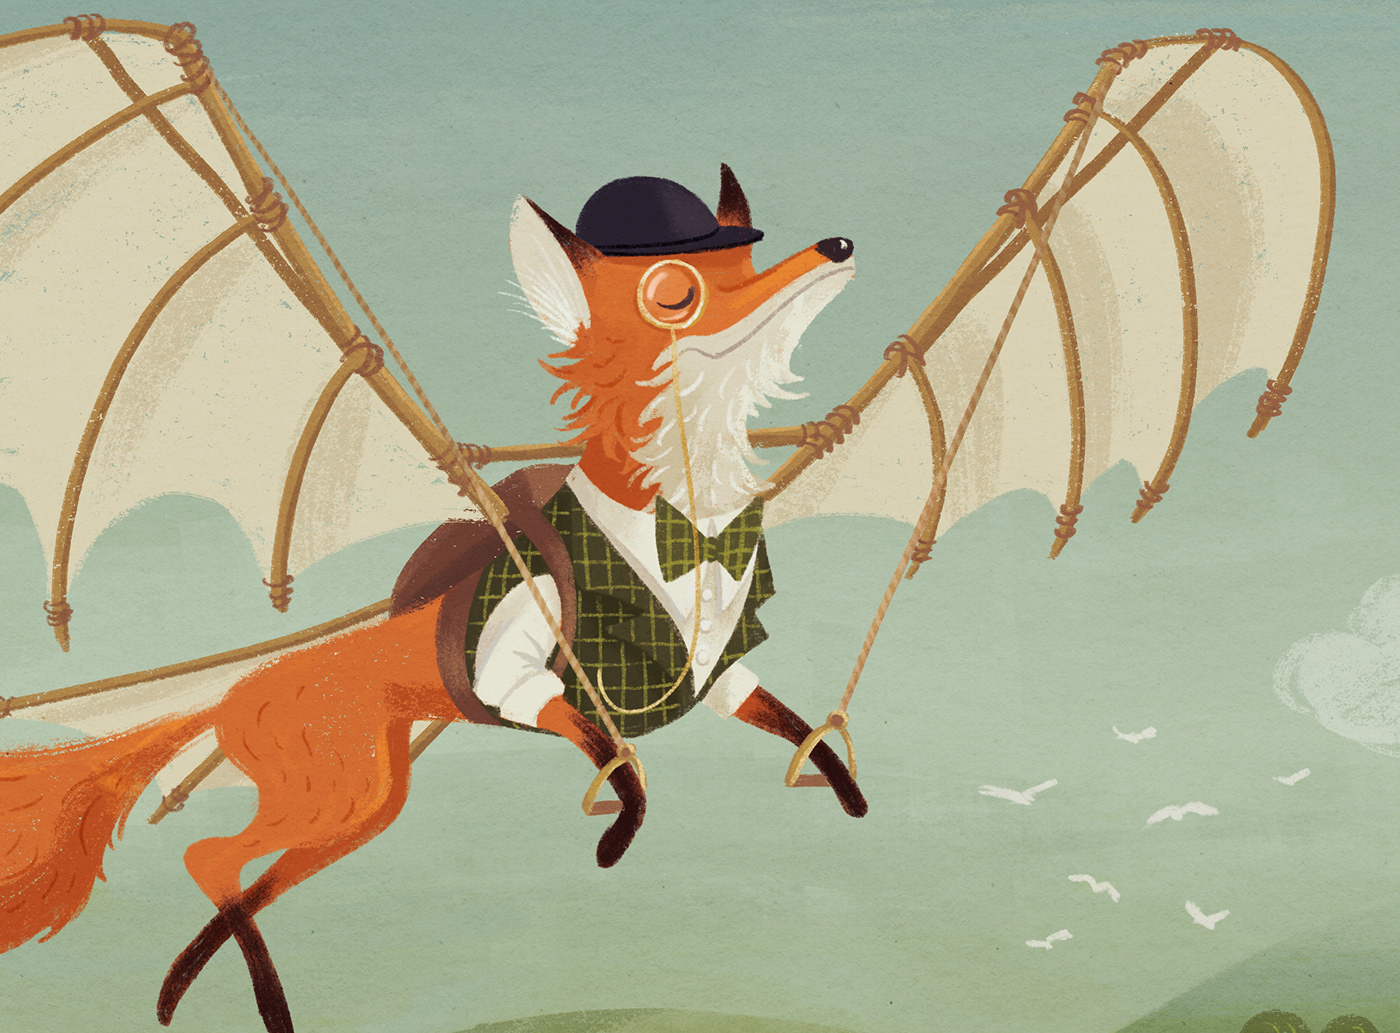 animal illustration british CDChallenge Character design  children's book cute FOX fox illustration kidlit Picture book